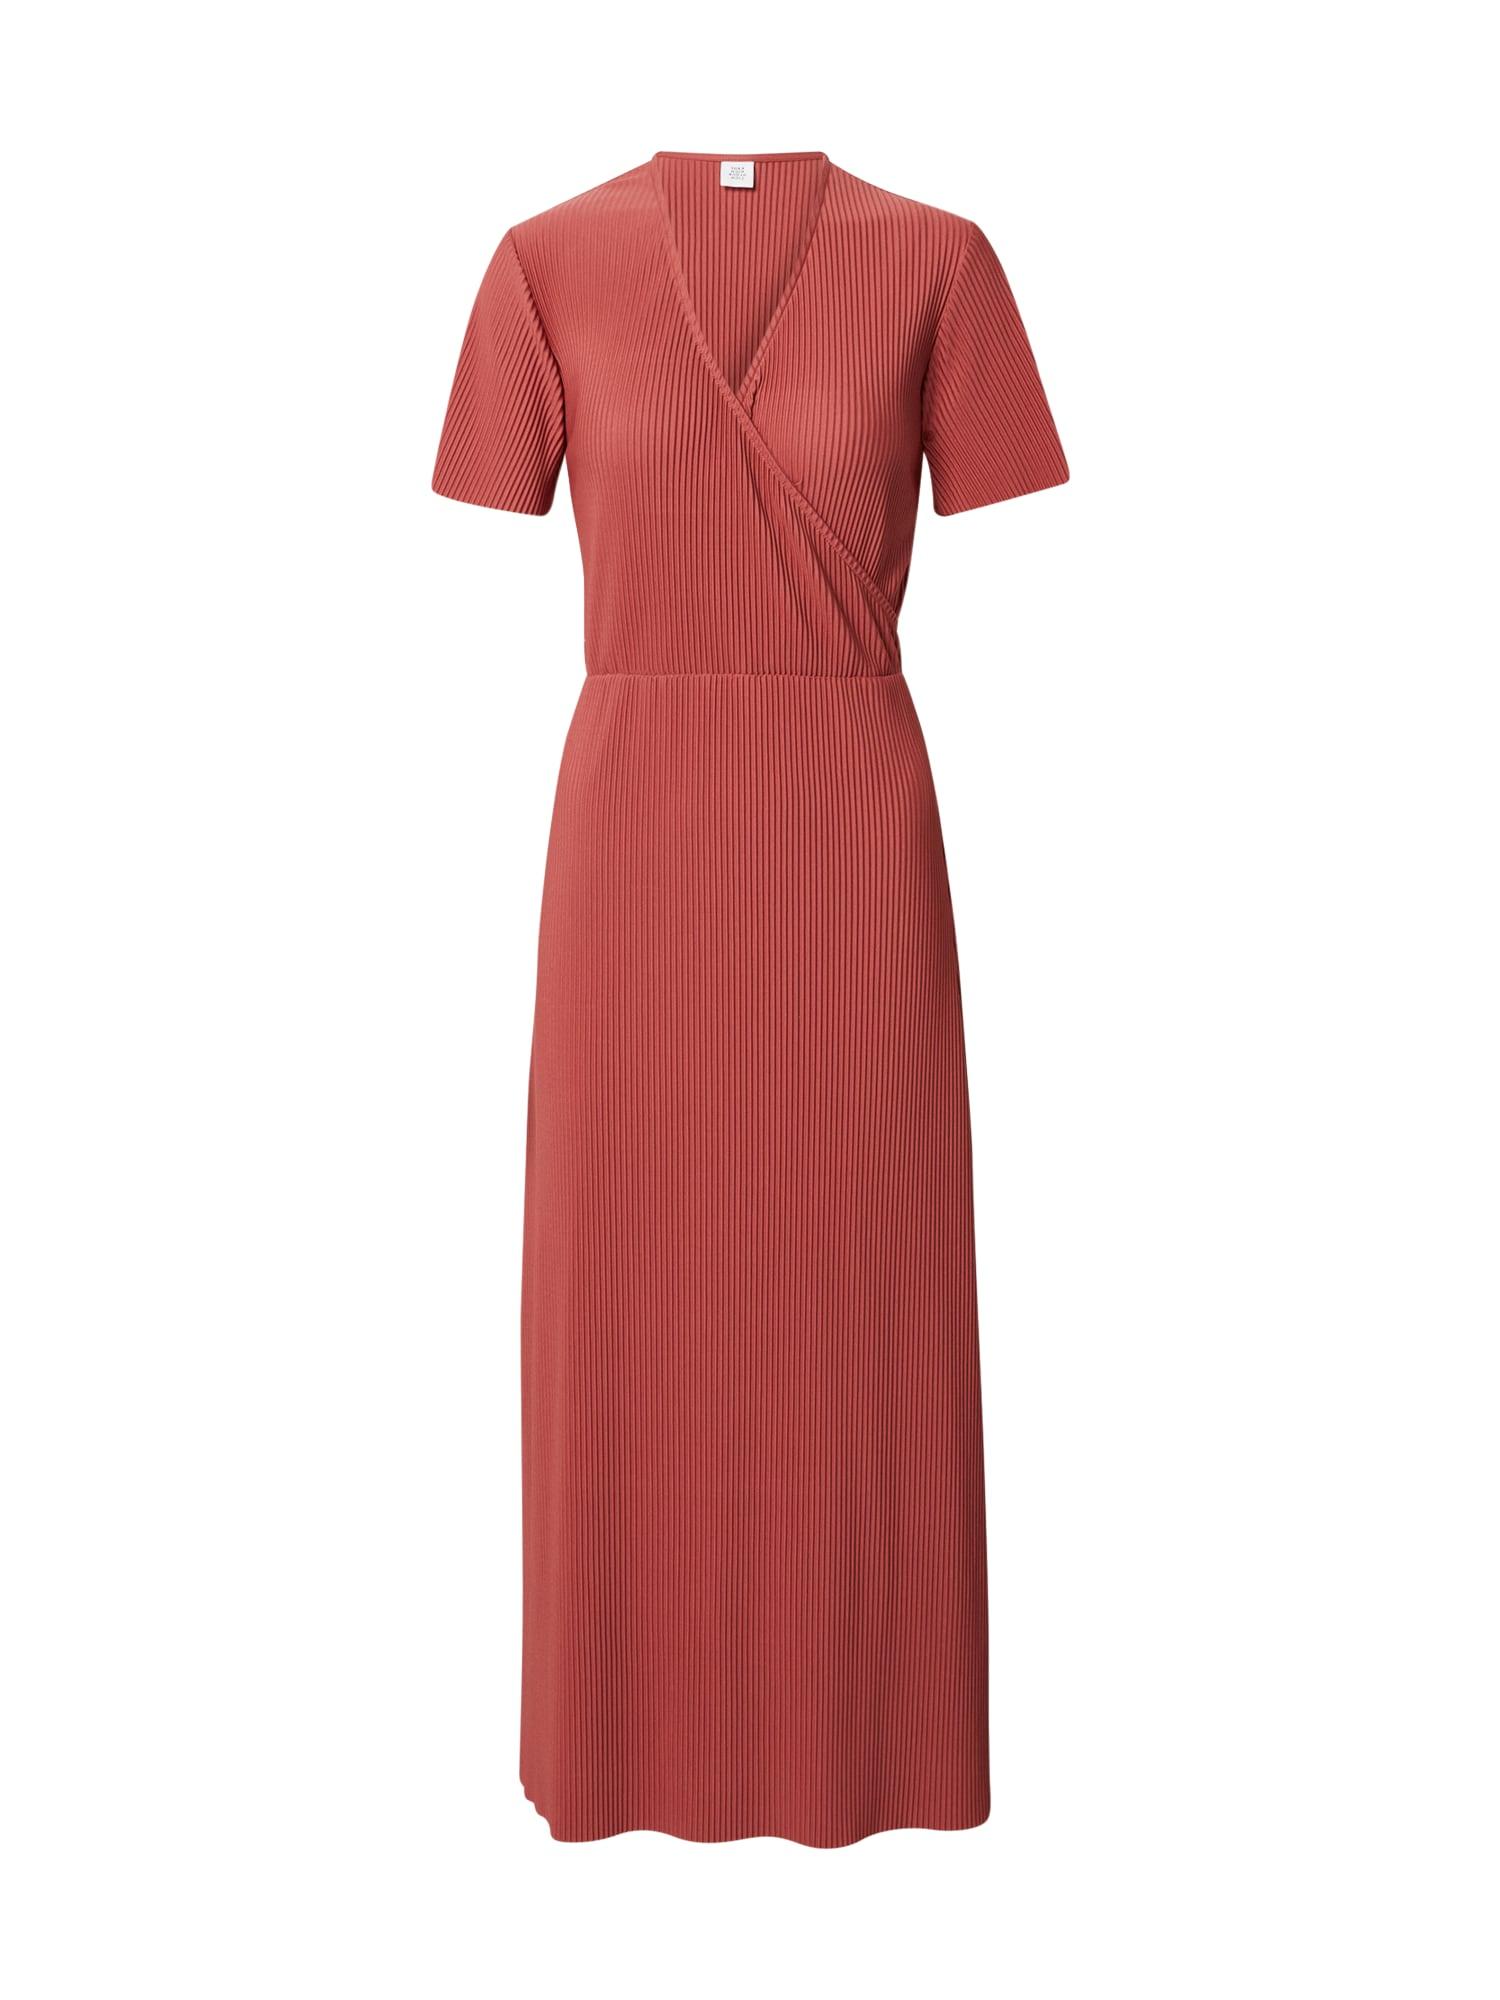 Kauf Dich Glücklich Suknelė raudona